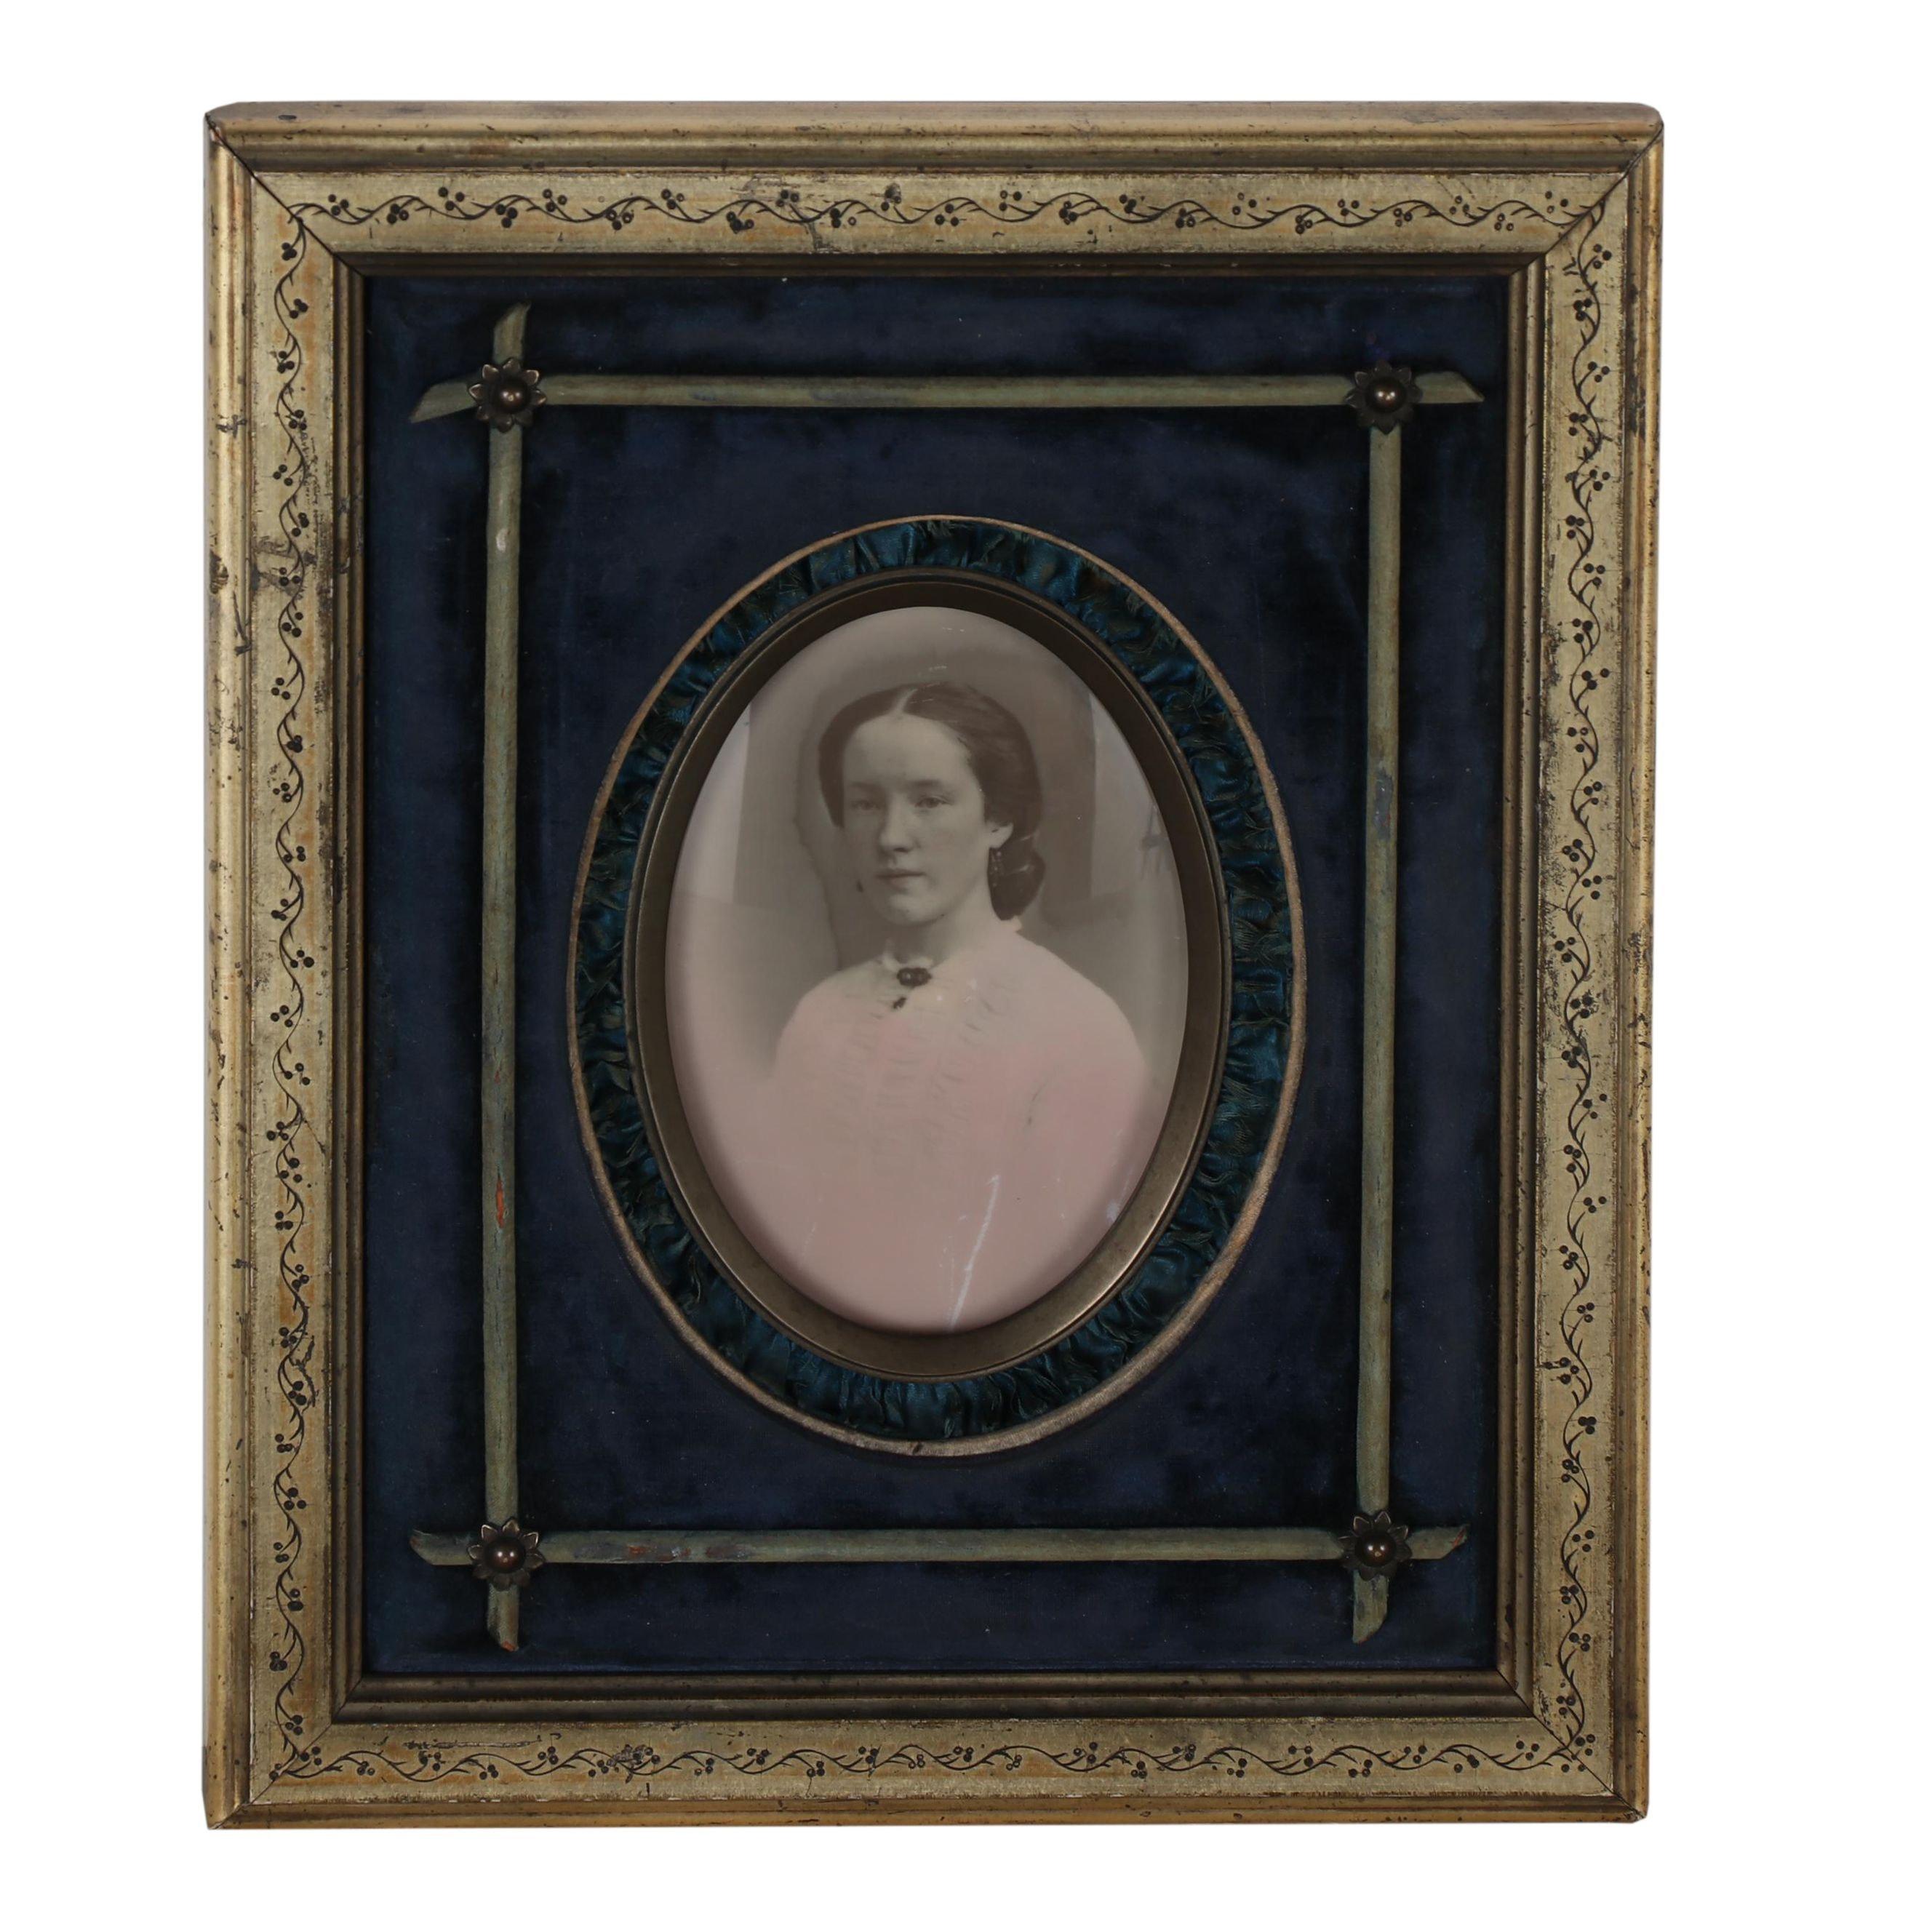 Opalotype Portrait Photograph, Circa 1880